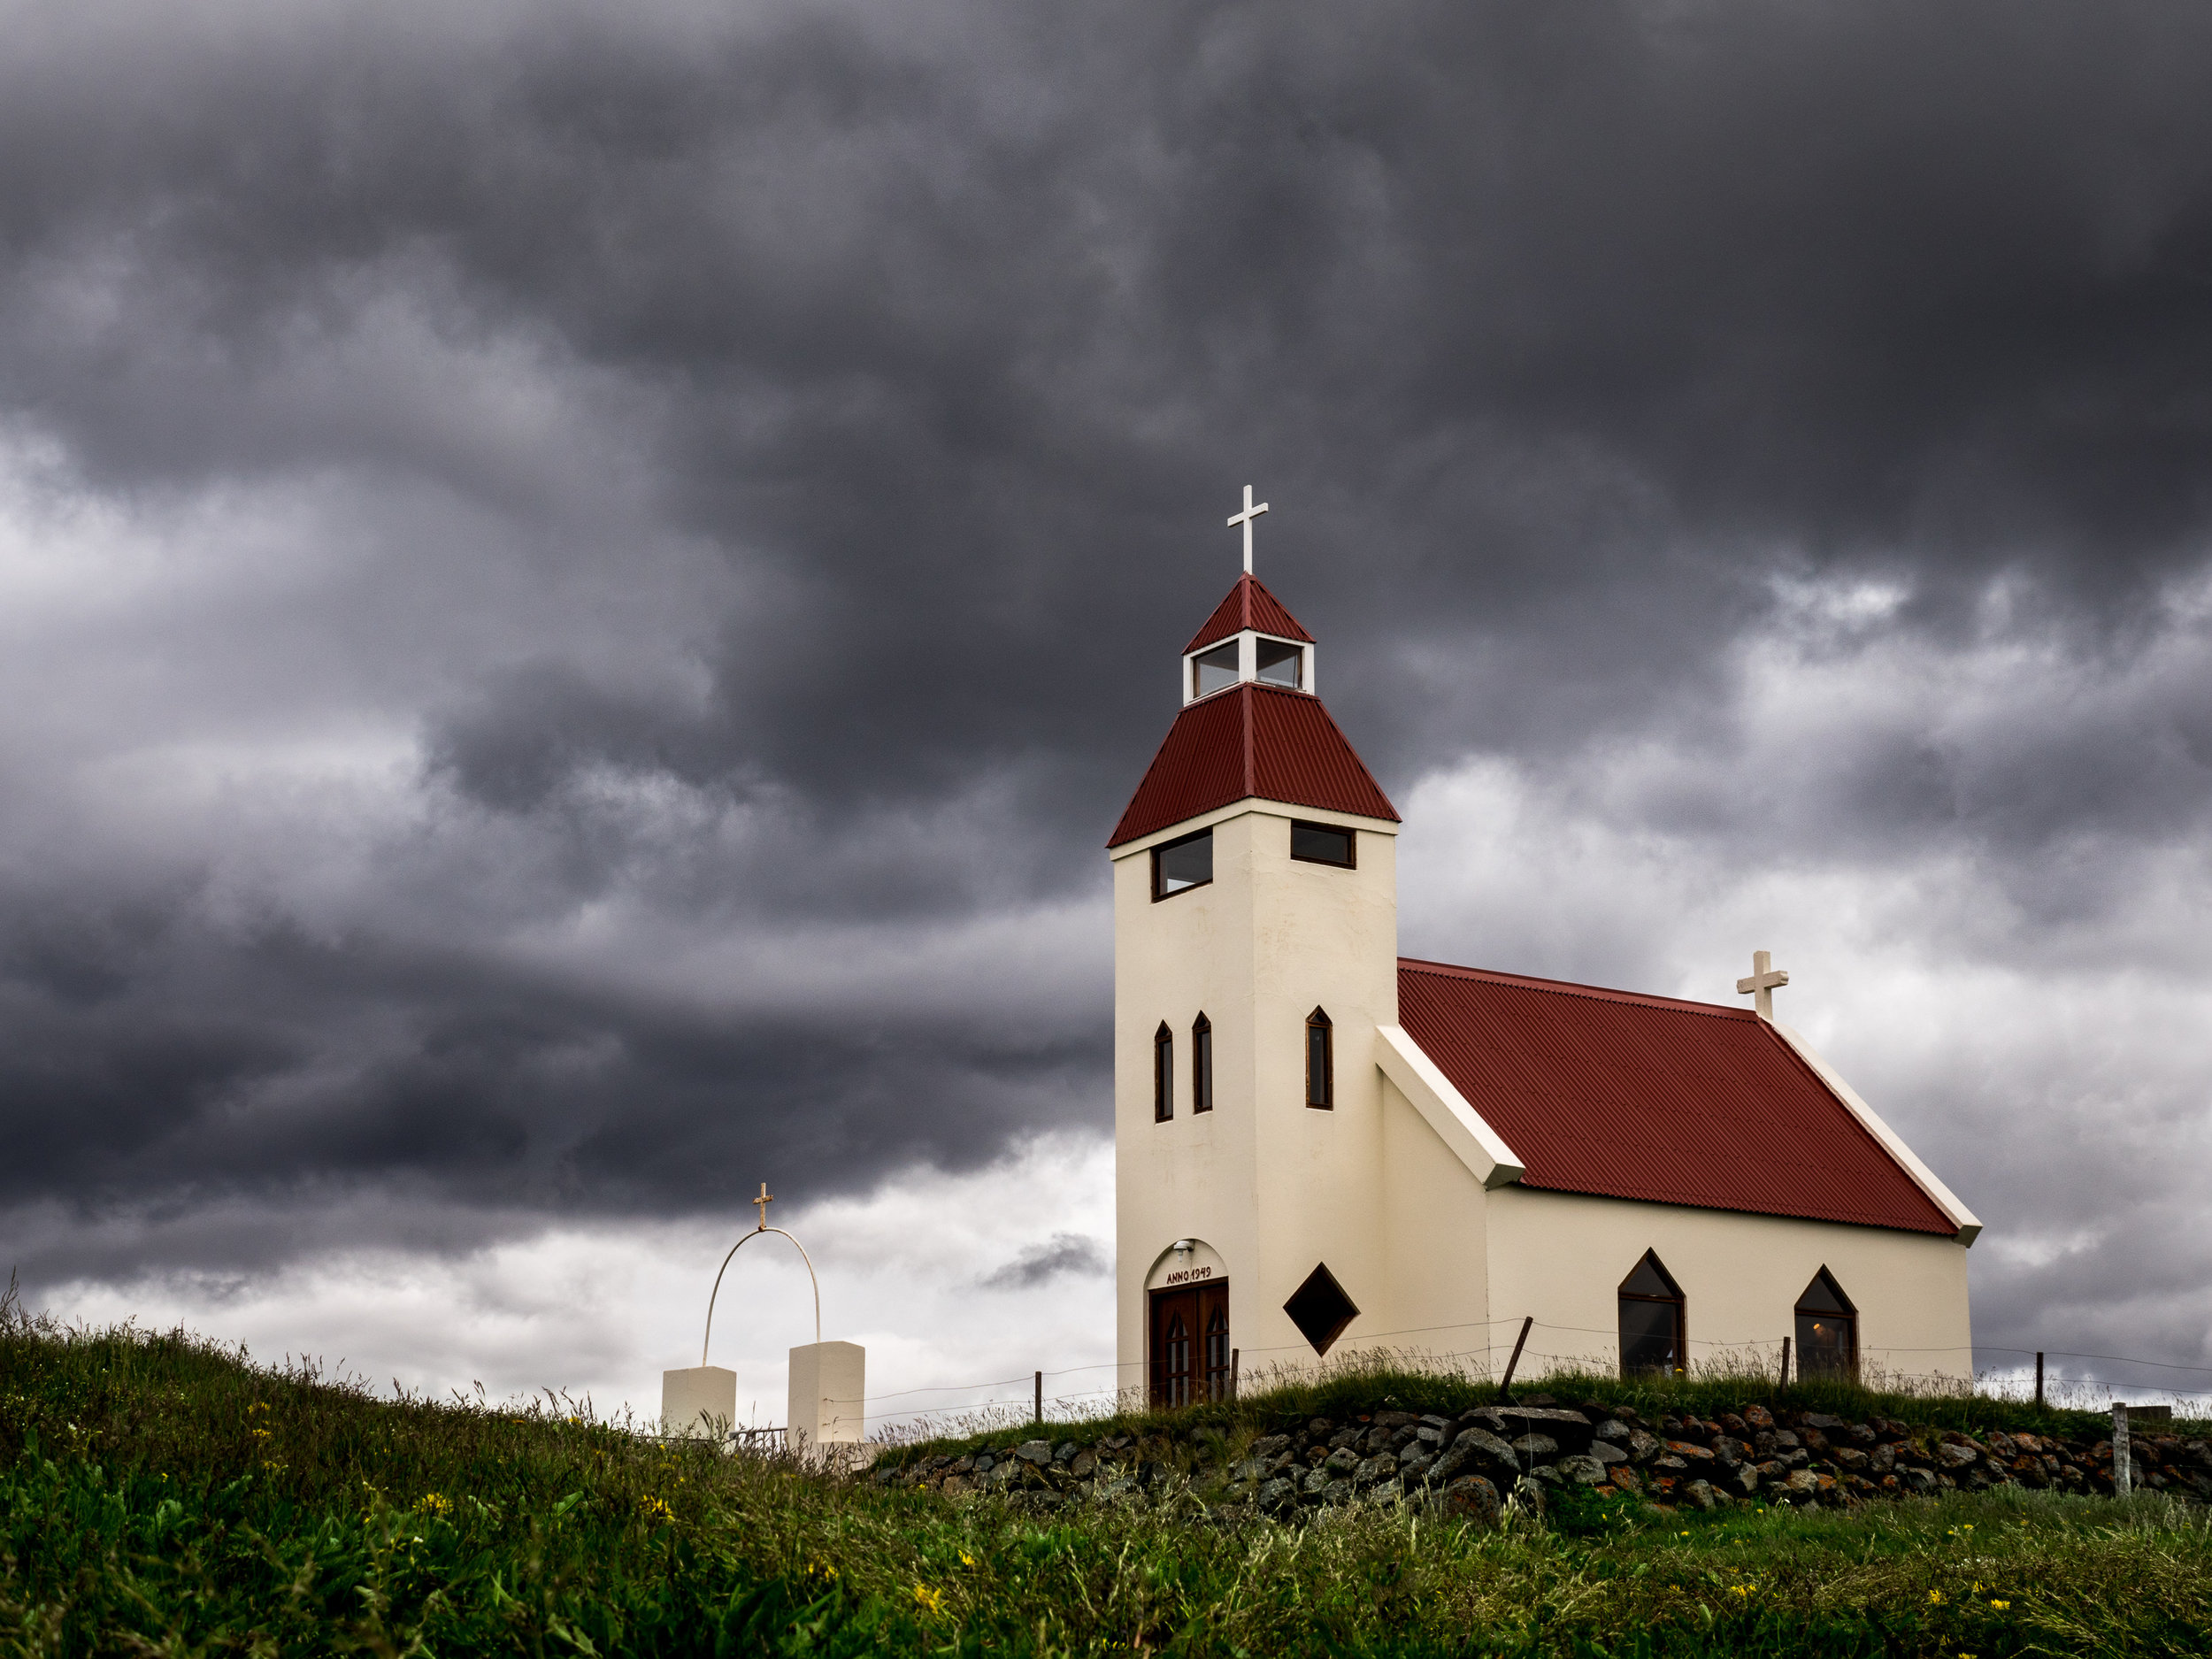 20170714-Iceland-P1099736-Edit.jpg